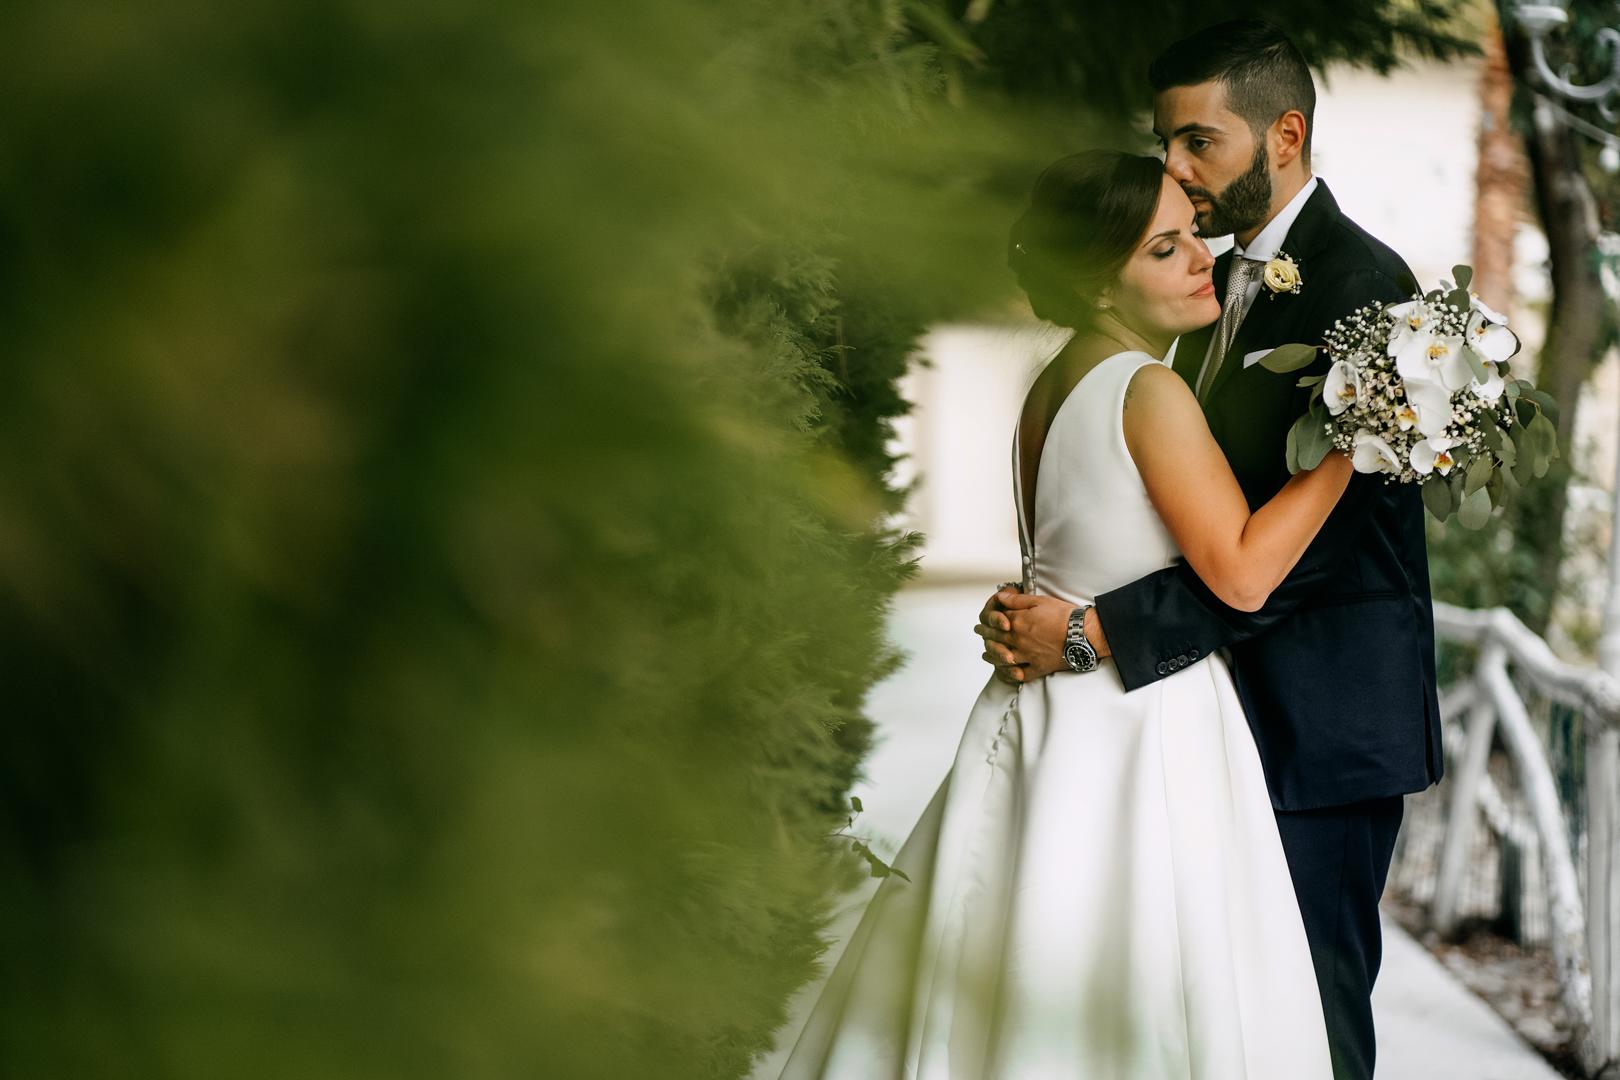 71 gianni-lepore-fotografo-foggia-provincia-matrimonio